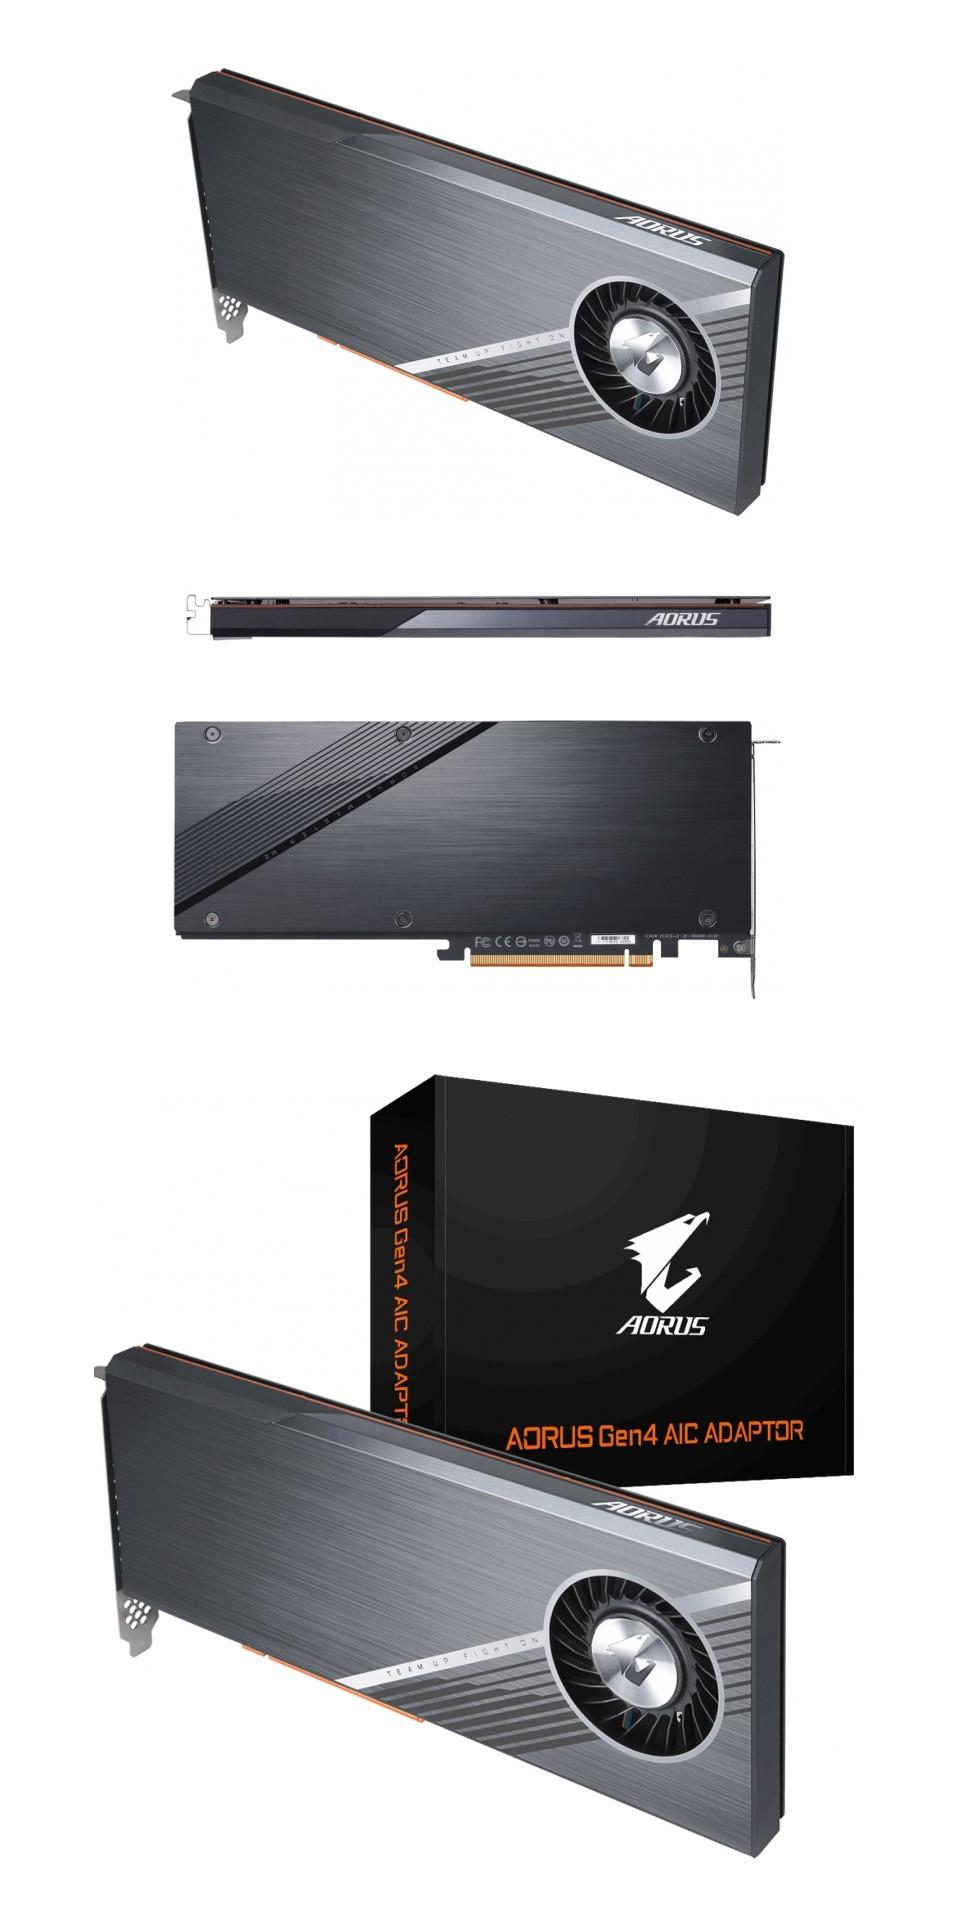 Gigabyte AORUS Gen4 PCIe 4x M.2 NVME Adaptor Card product